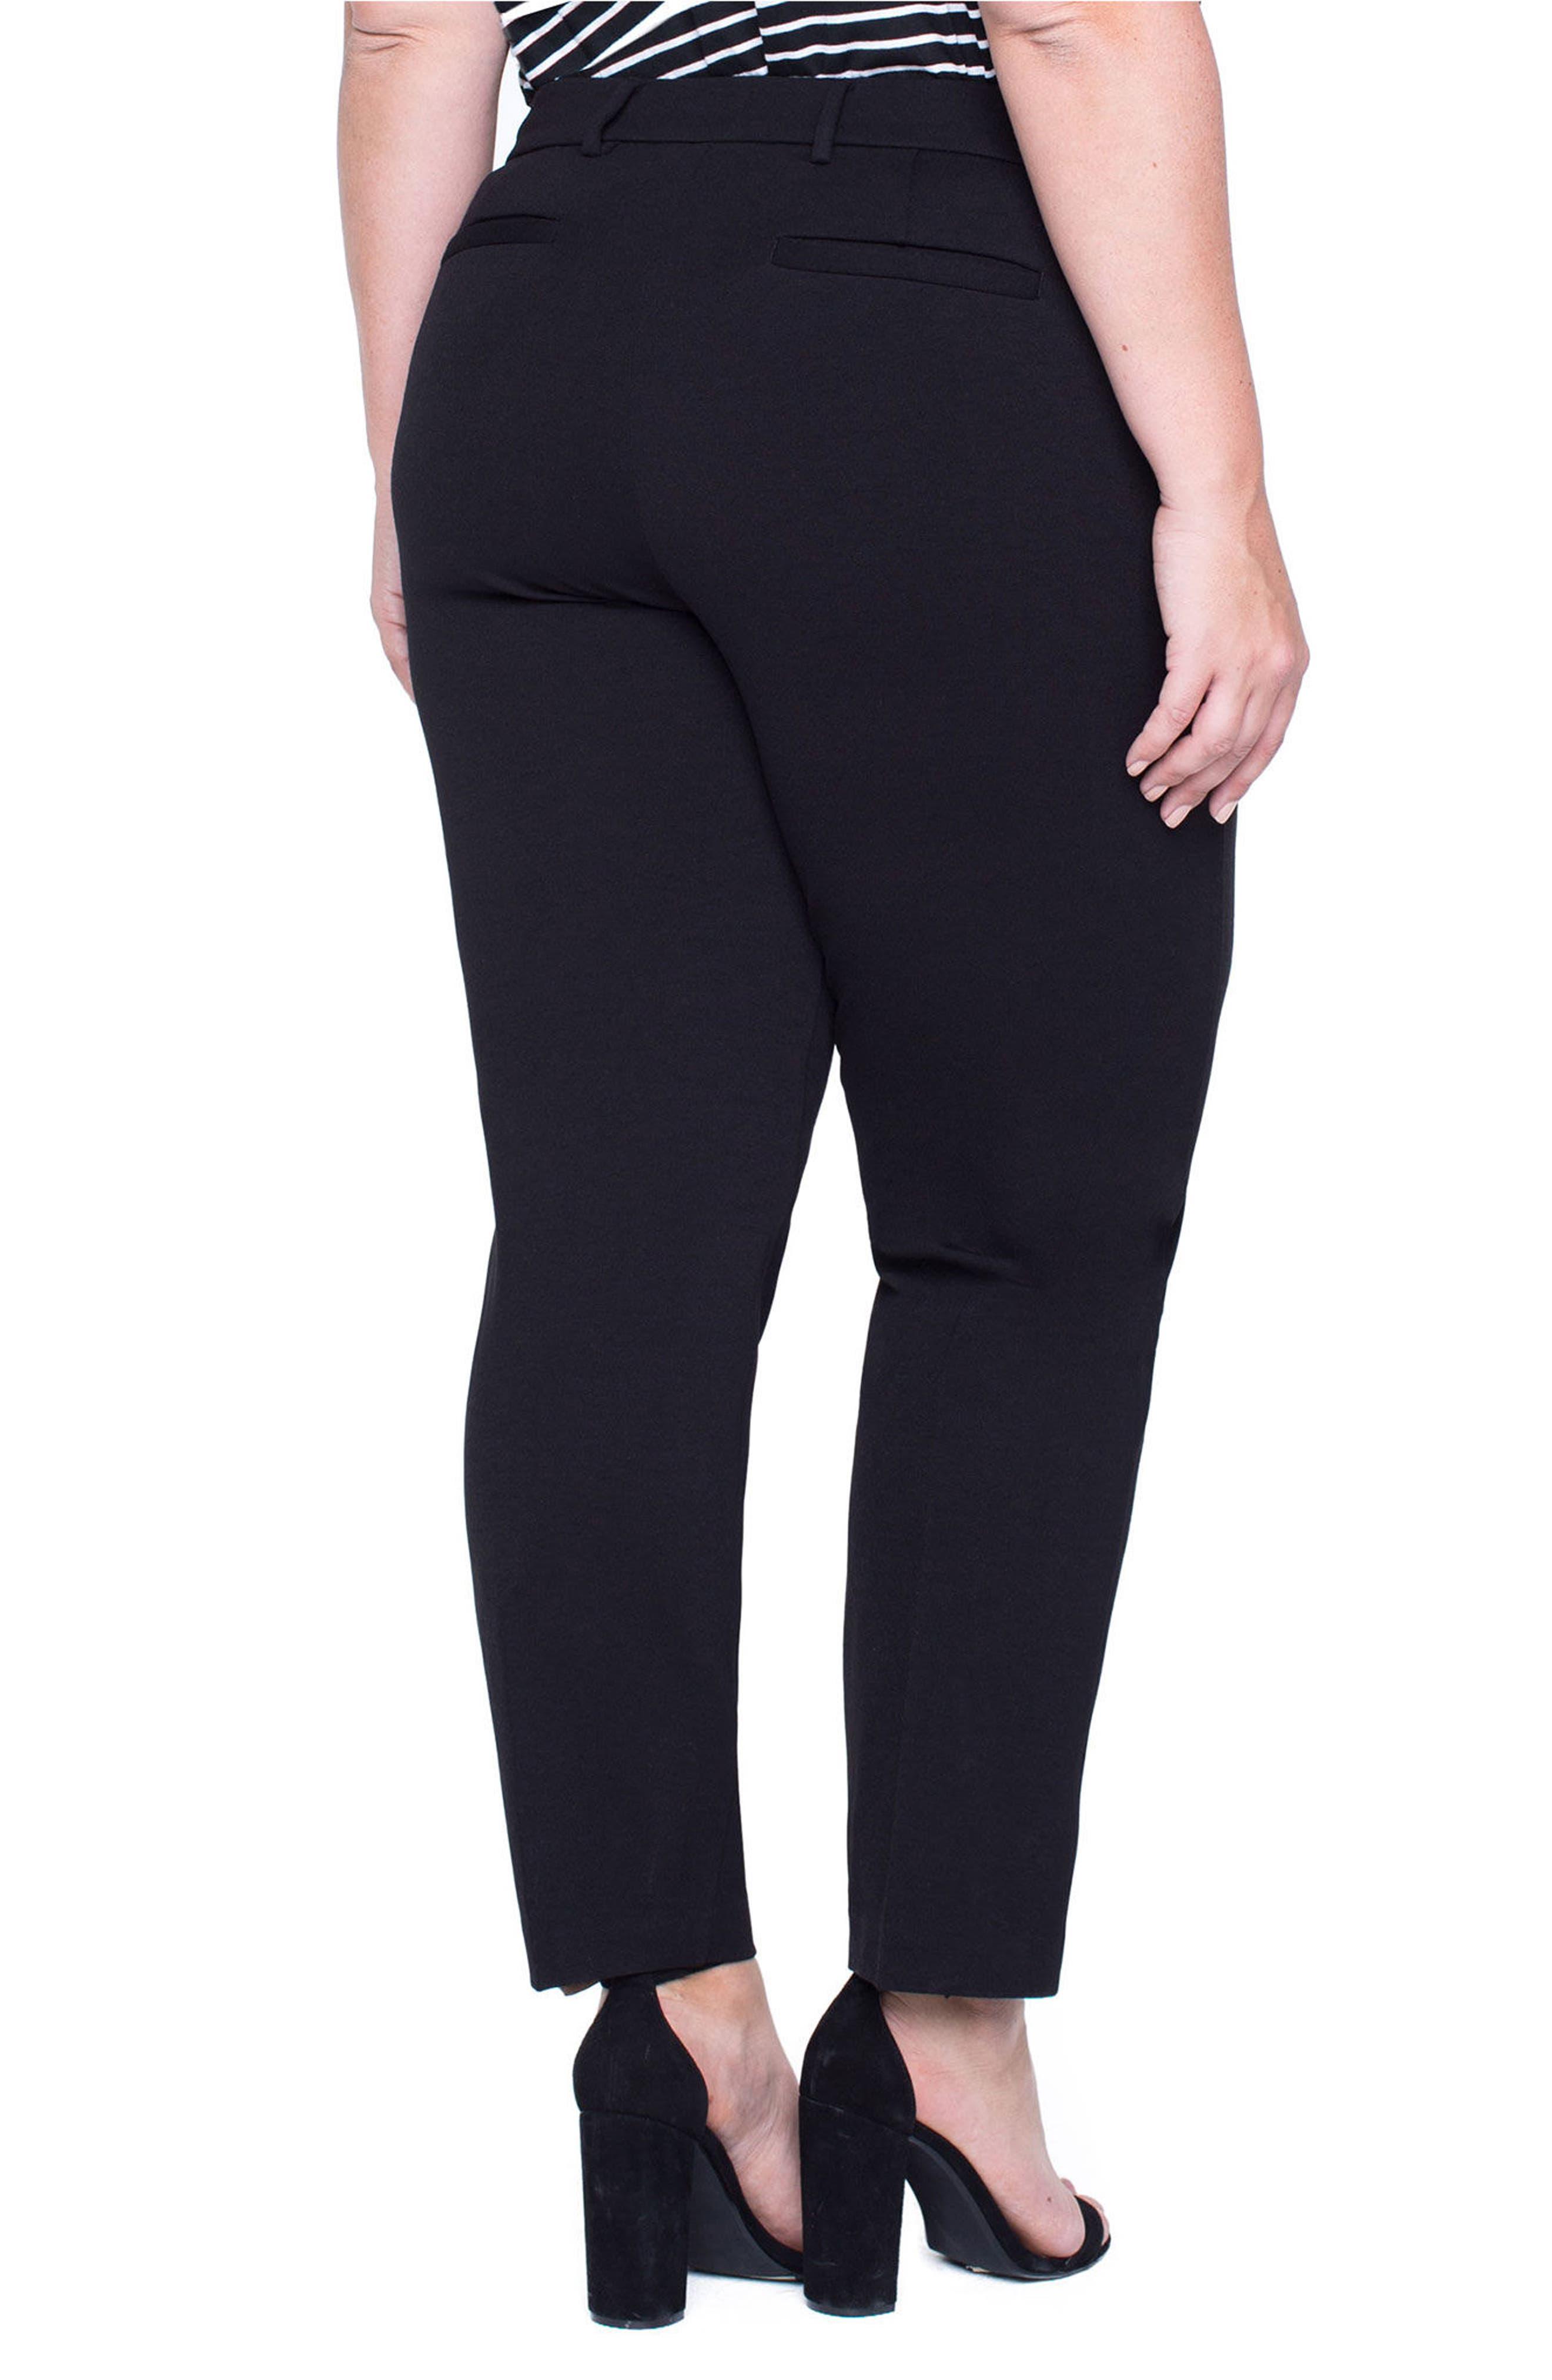 Kelsey Ponte Knit Trousers,                             Alternate thumbnail 3, color,                             Black